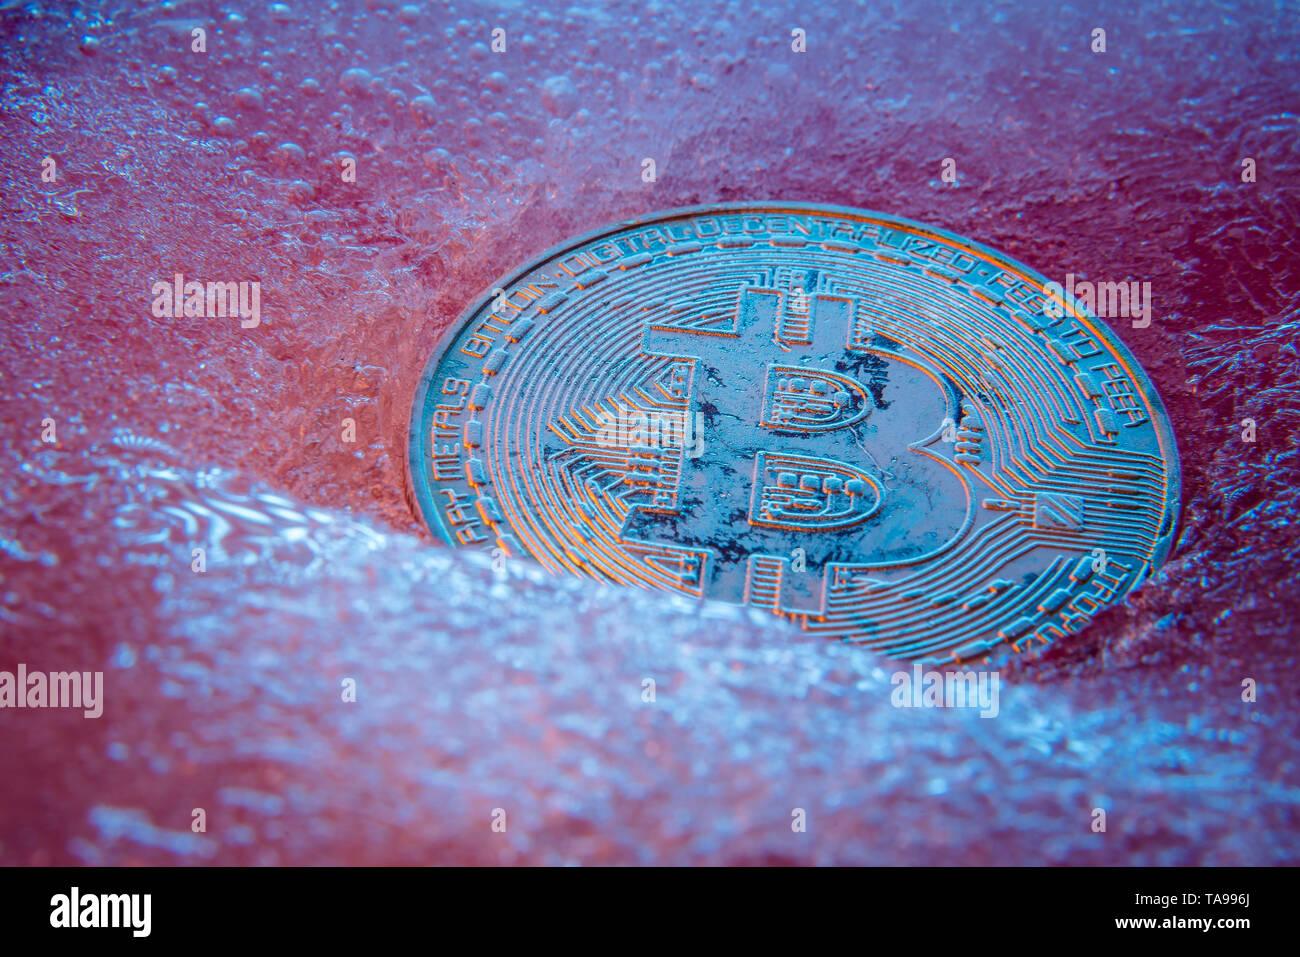 Silver Bitcoin, bit coin online digital currency frozen in the blue ice. Concept of block chain, crypto market crash. Frozen crypto money, depreciatio - Stock Image